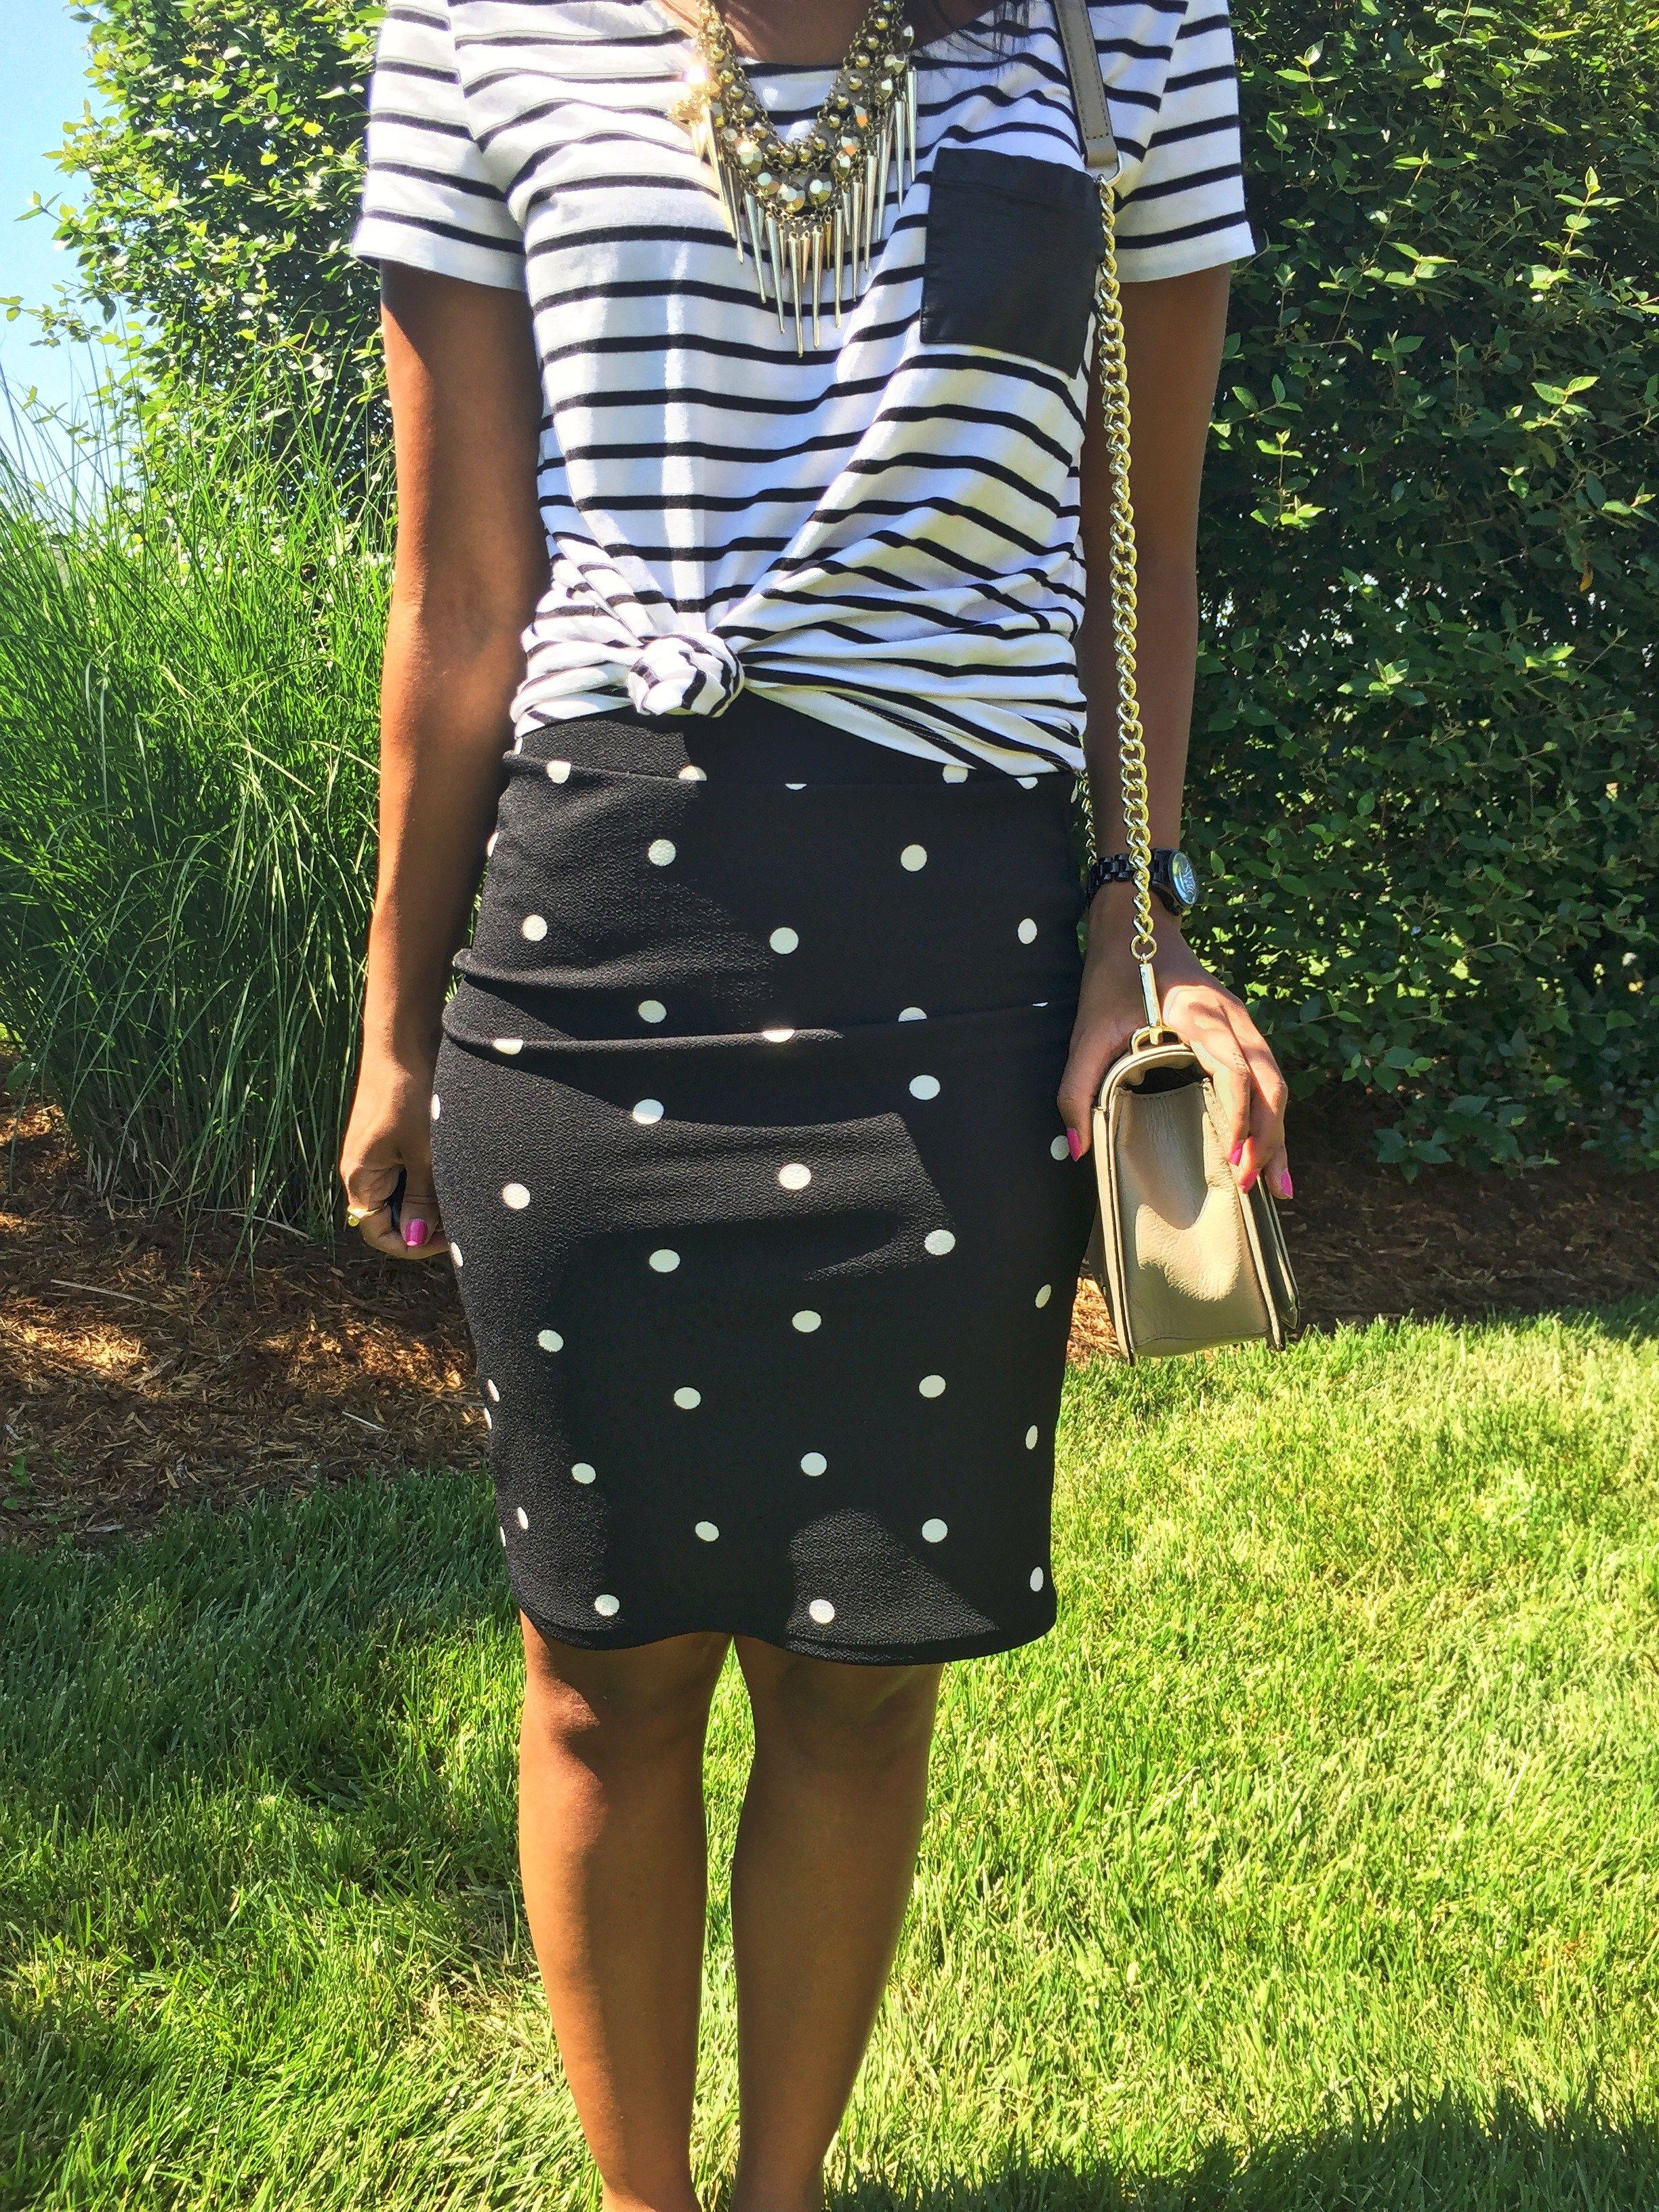 fd4db8c6c61 What Nicole Wore  LuLaRoe Cassie Skirt    polka dot pencil skirt